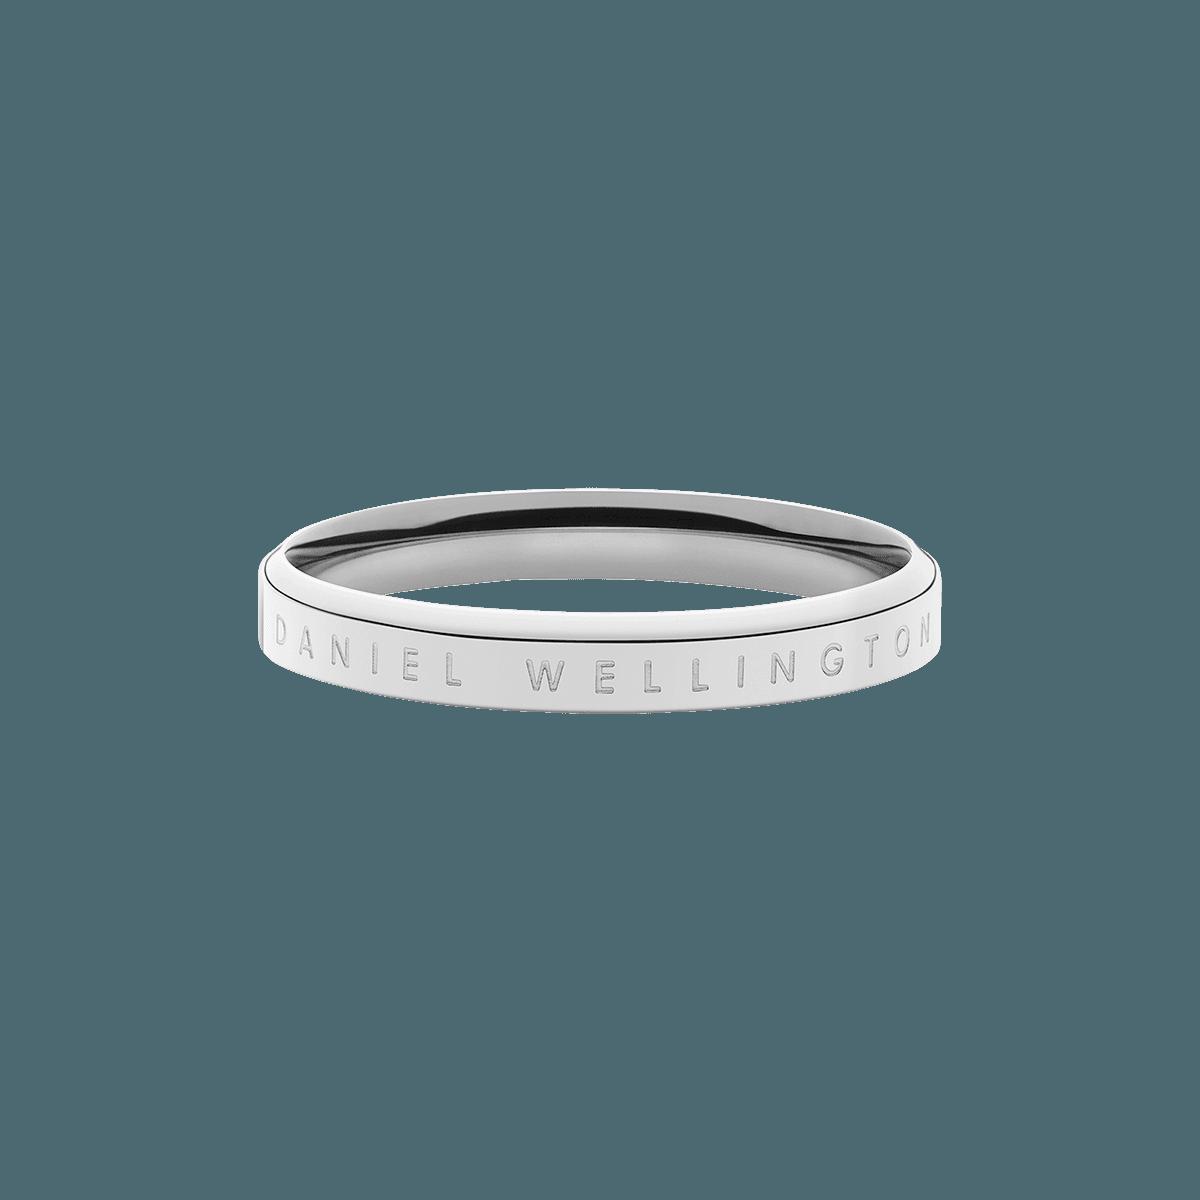 dw官网 dw手表官网 dw中国官网 dw官方旗舰店 DW DW官网  Classic Ring Silver 64mm